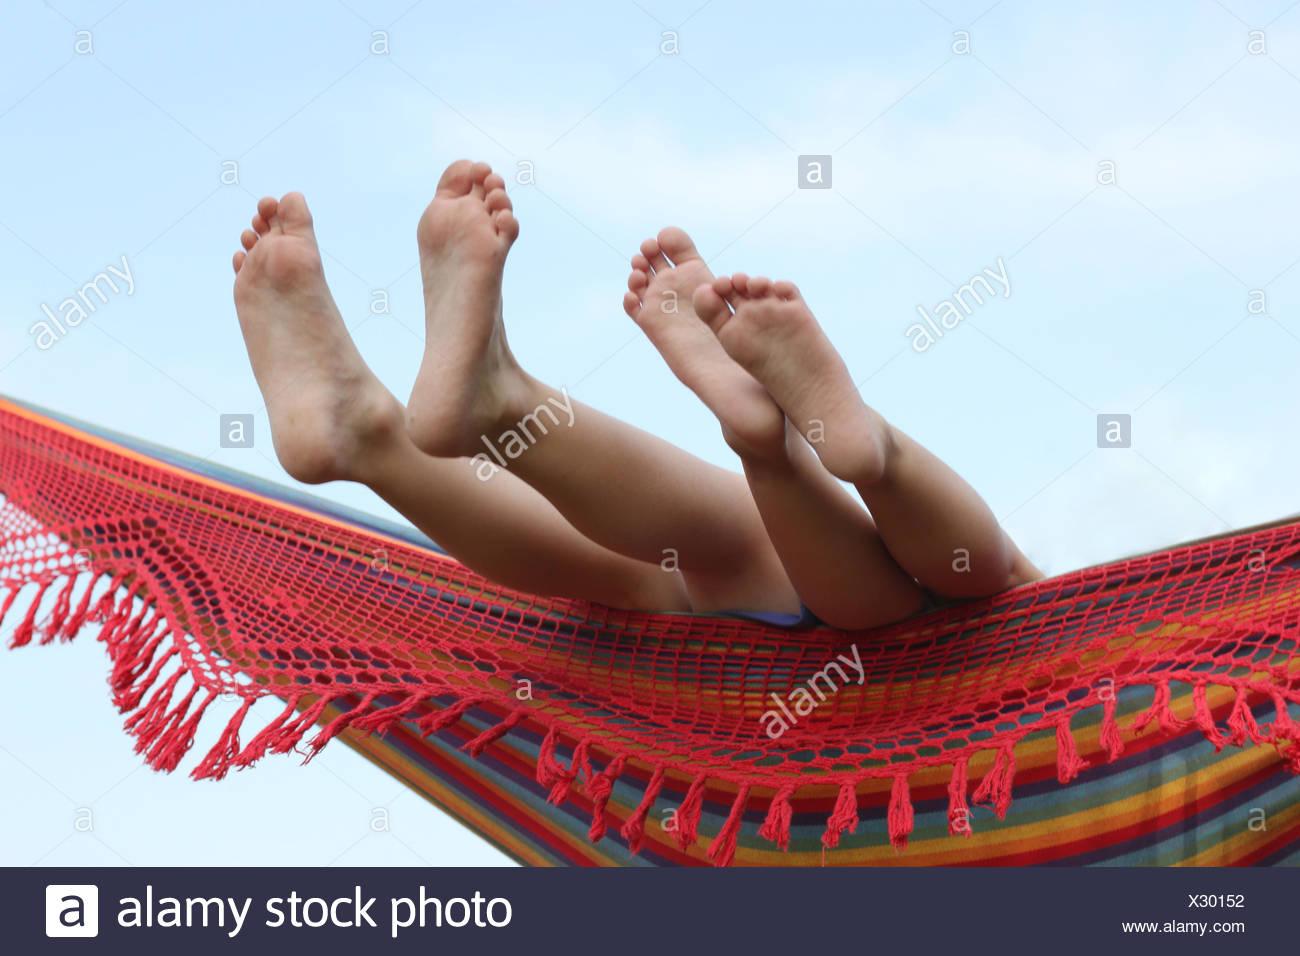 Children's feet in hammock - Stock Image